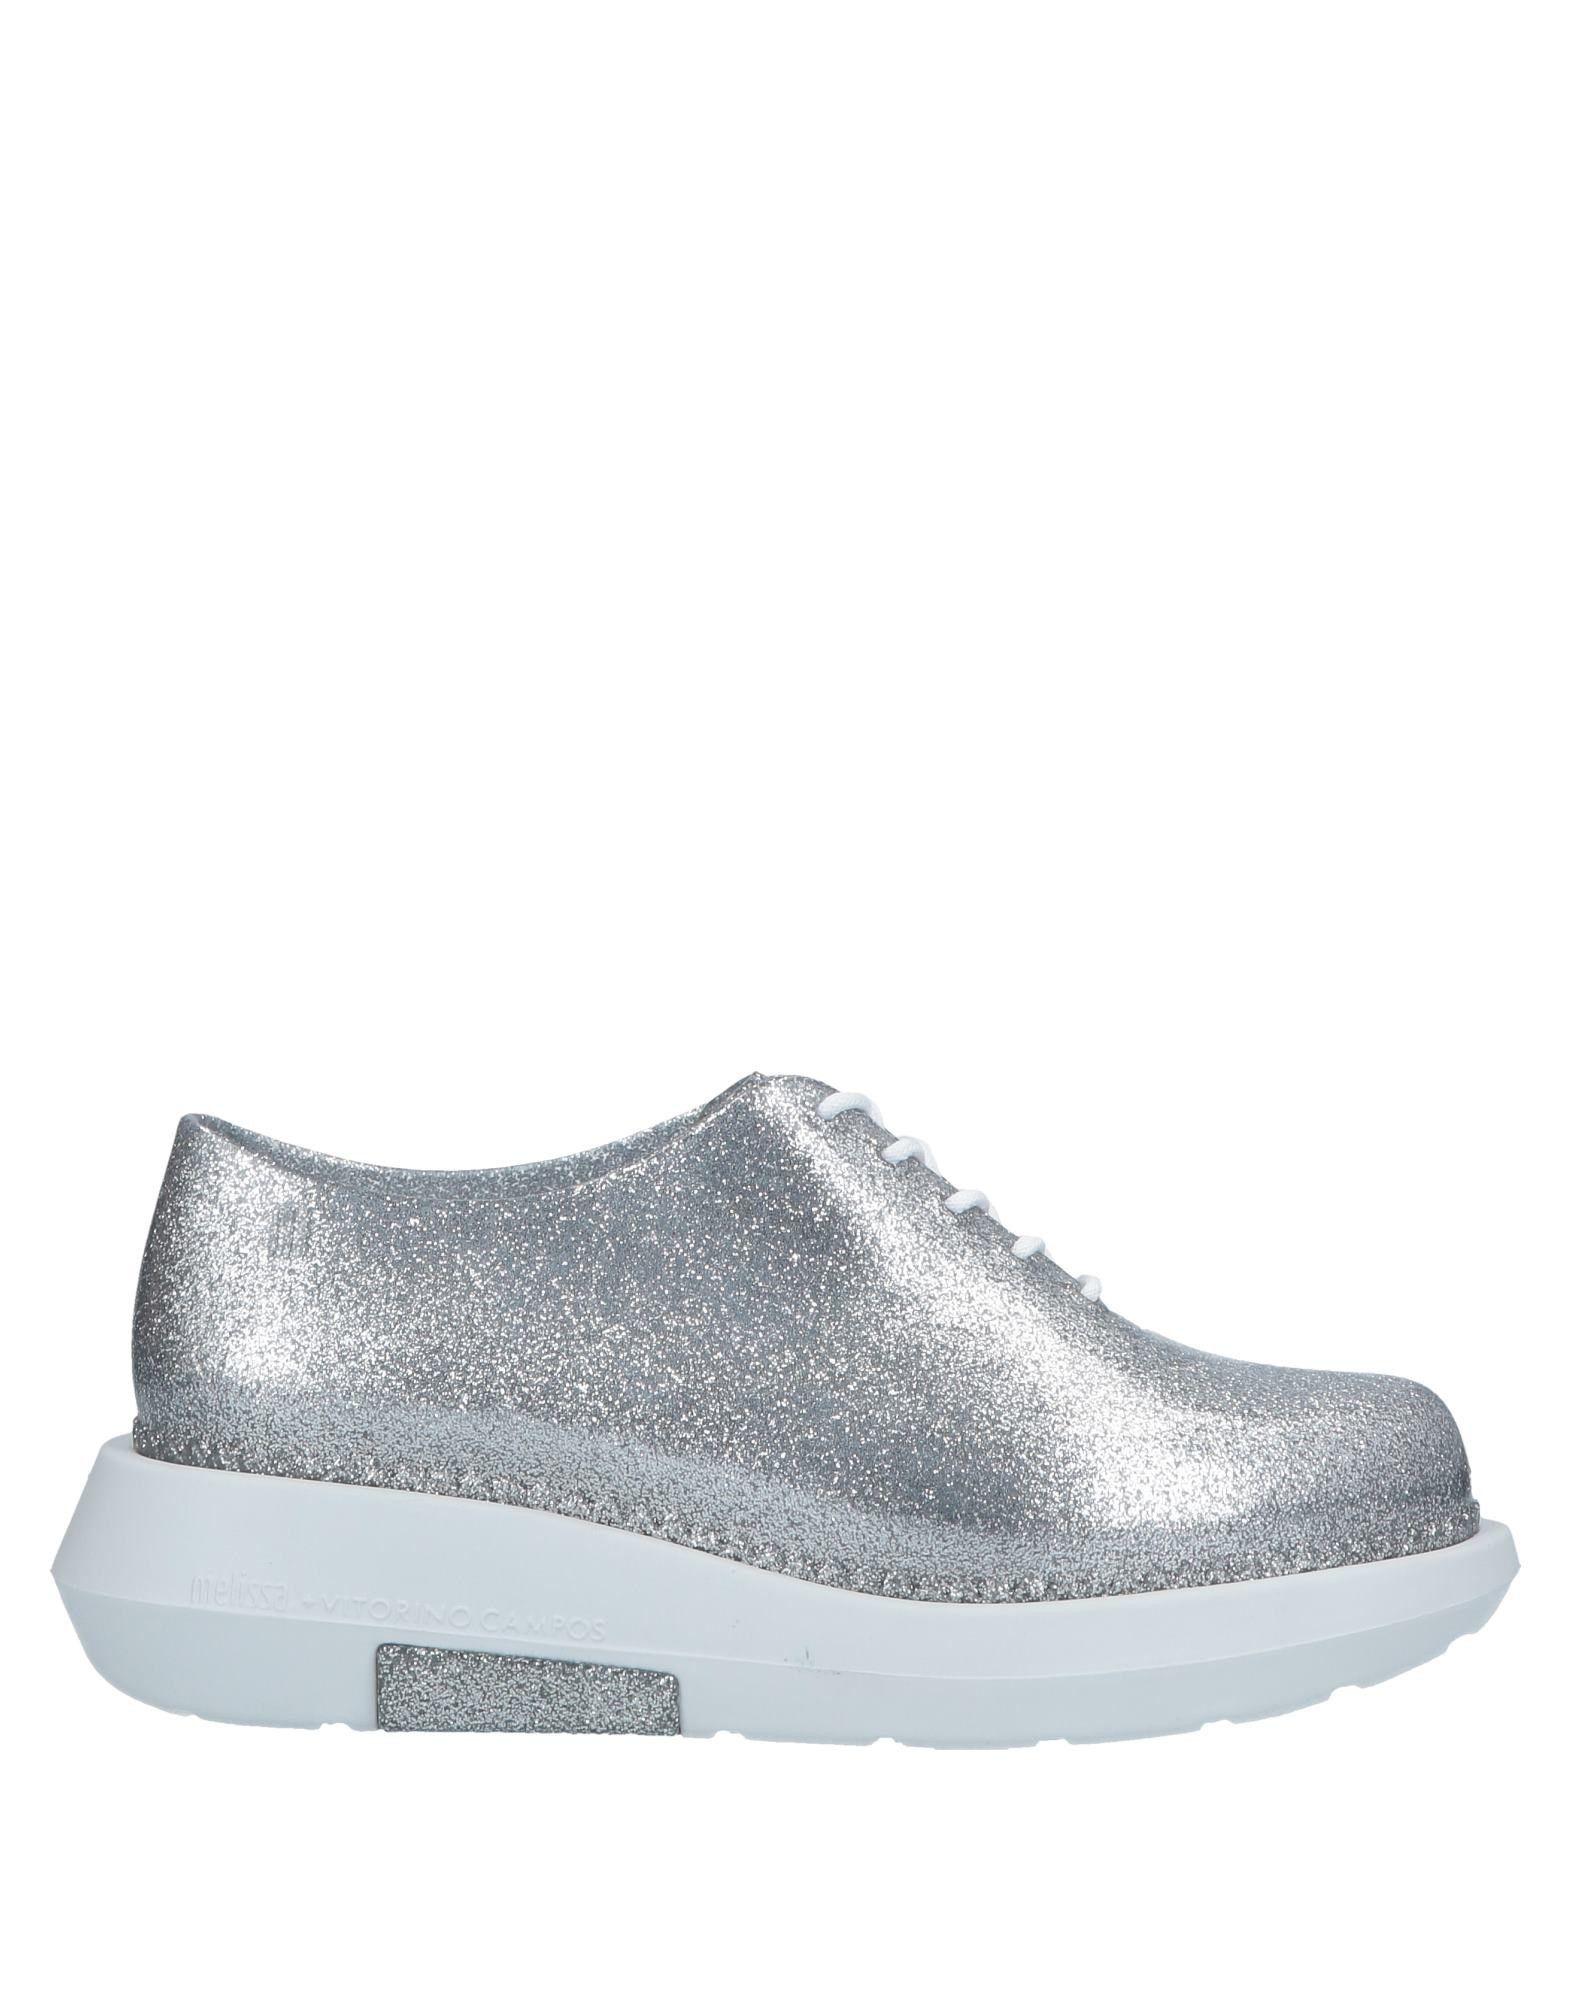 MELISSA + VITORINO CAMPOS Обувь на шнурках melissa vitorino campos обувь на шнурках